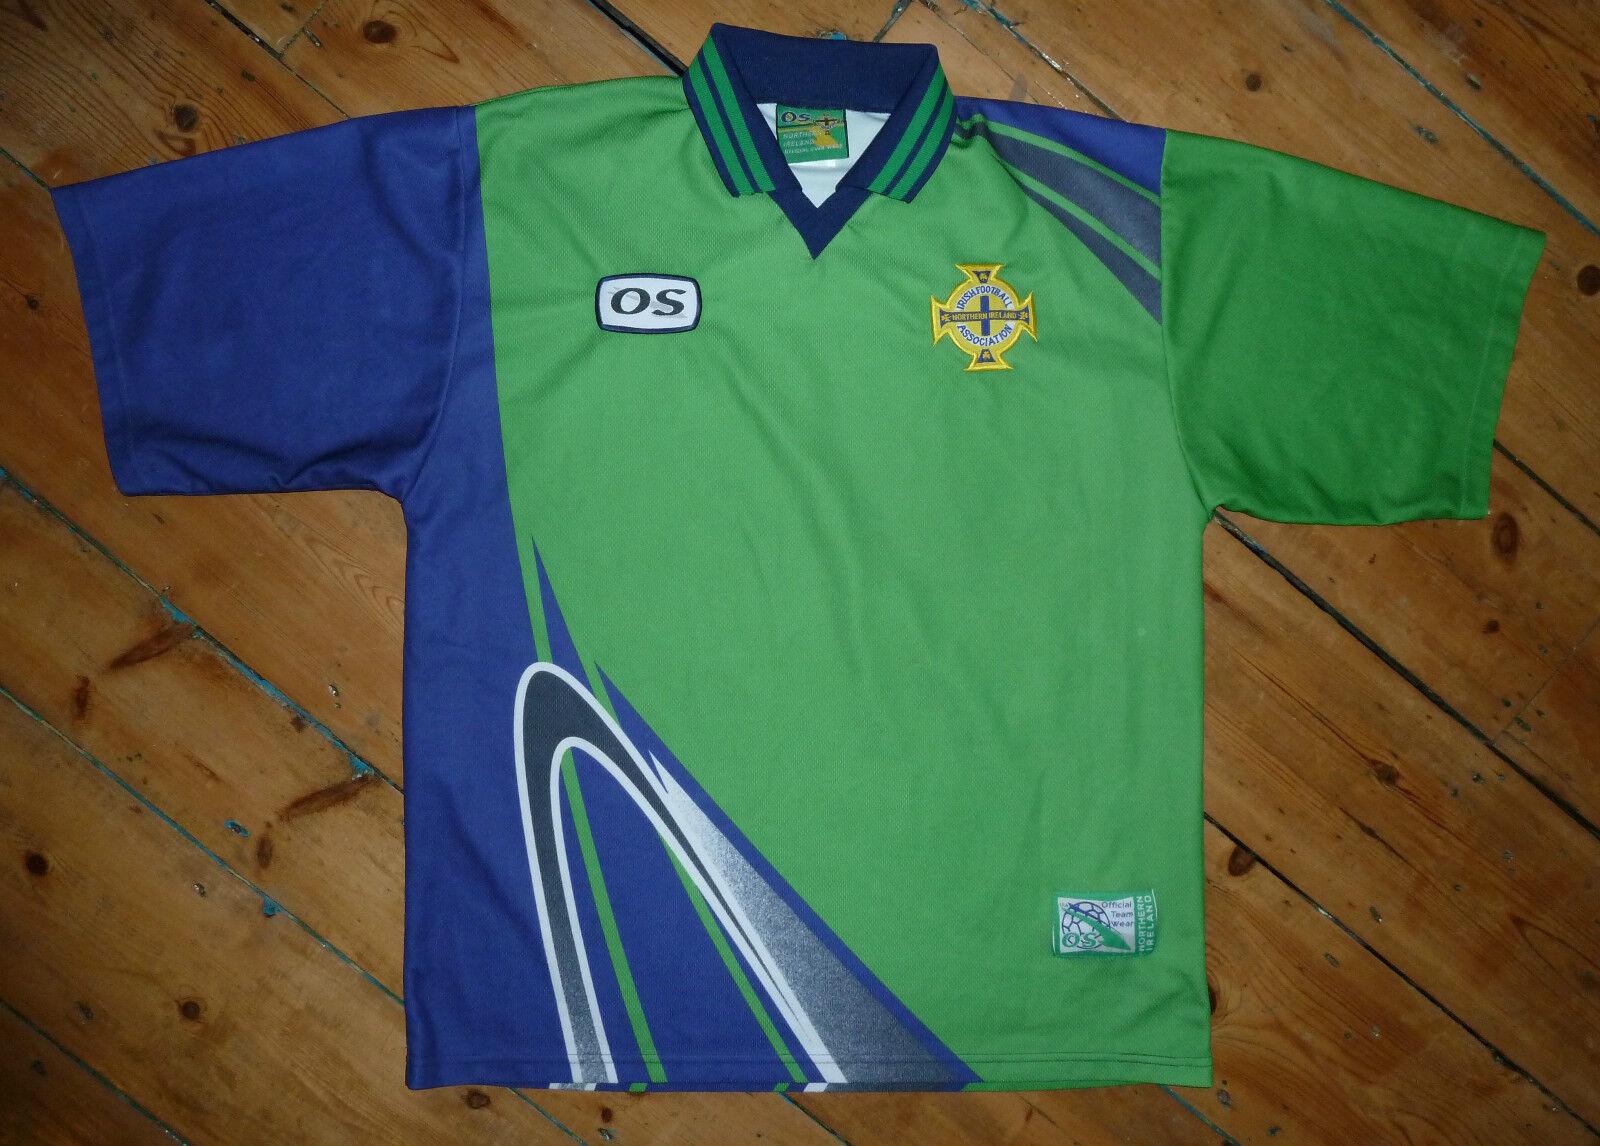 XL Irlea del Nord SHIRT SOCCER JERSEY AWAY Top 1998 Ulster Rangers nornirn